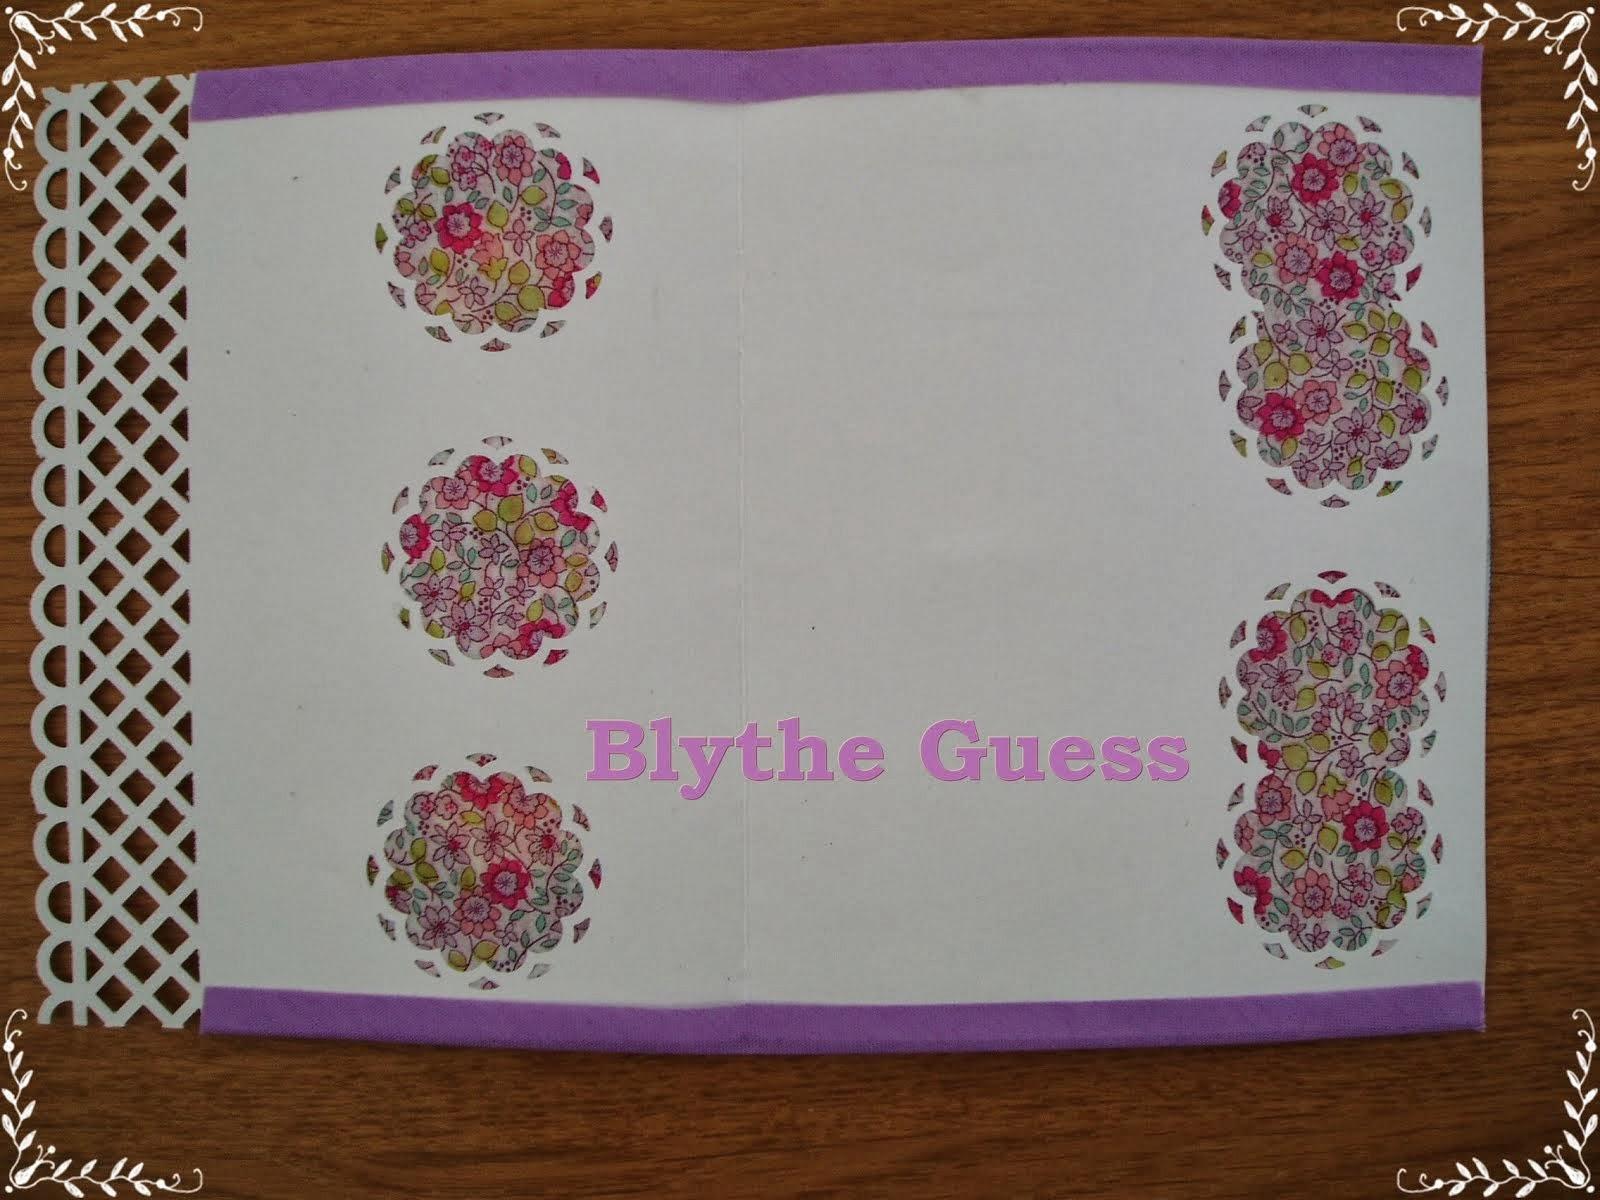 Blythe Guess